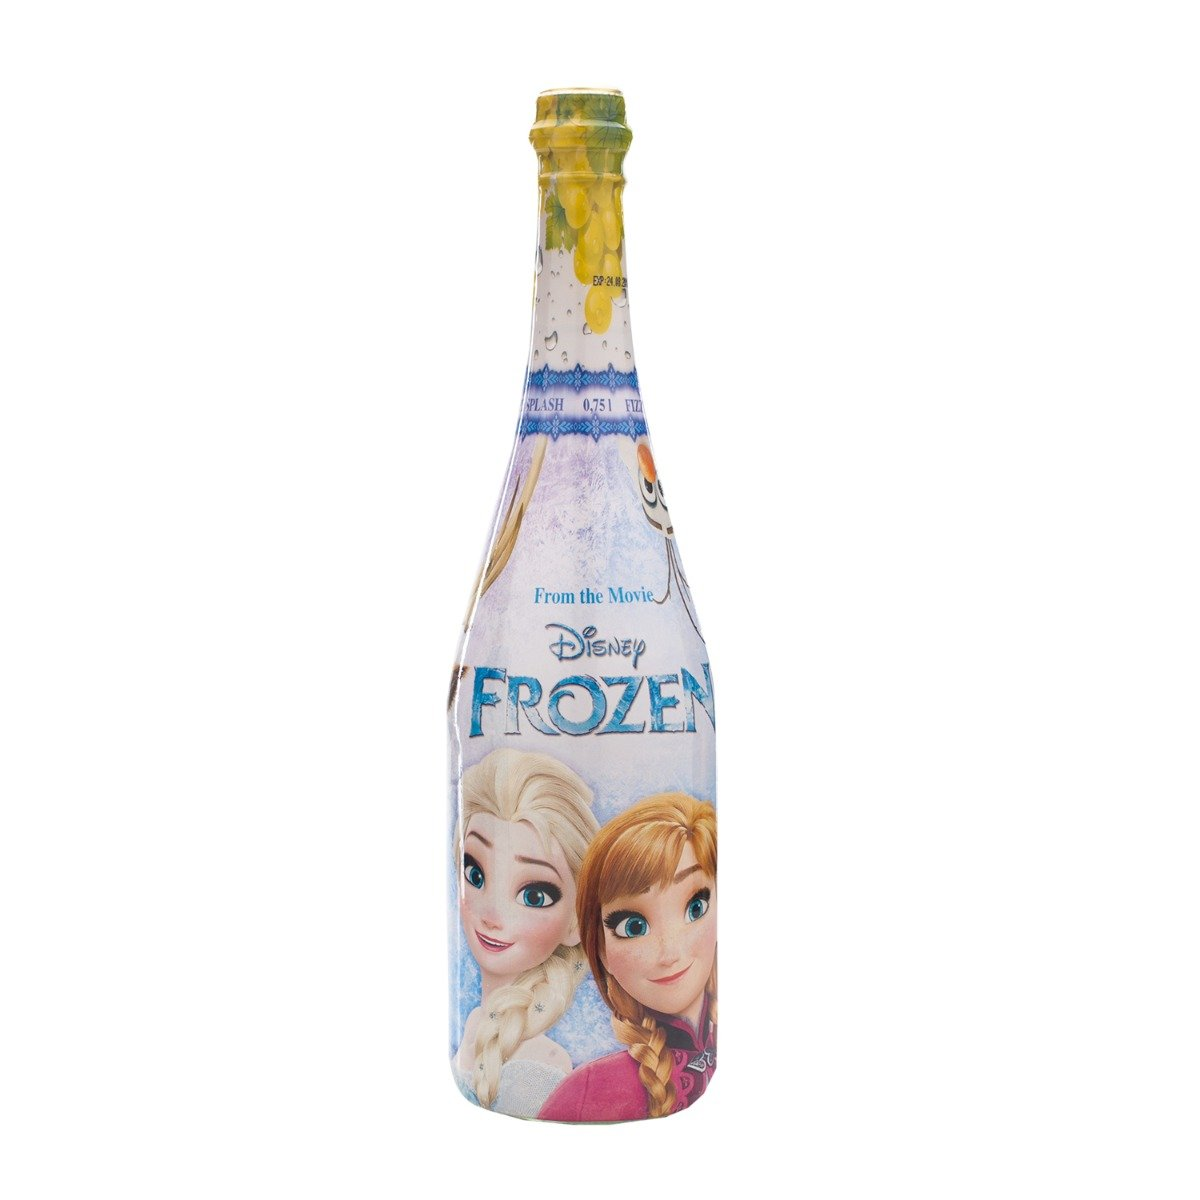 Sampanie pentru copii cu strugure Vitapress, Disney Frozen, 0.75 L imagine